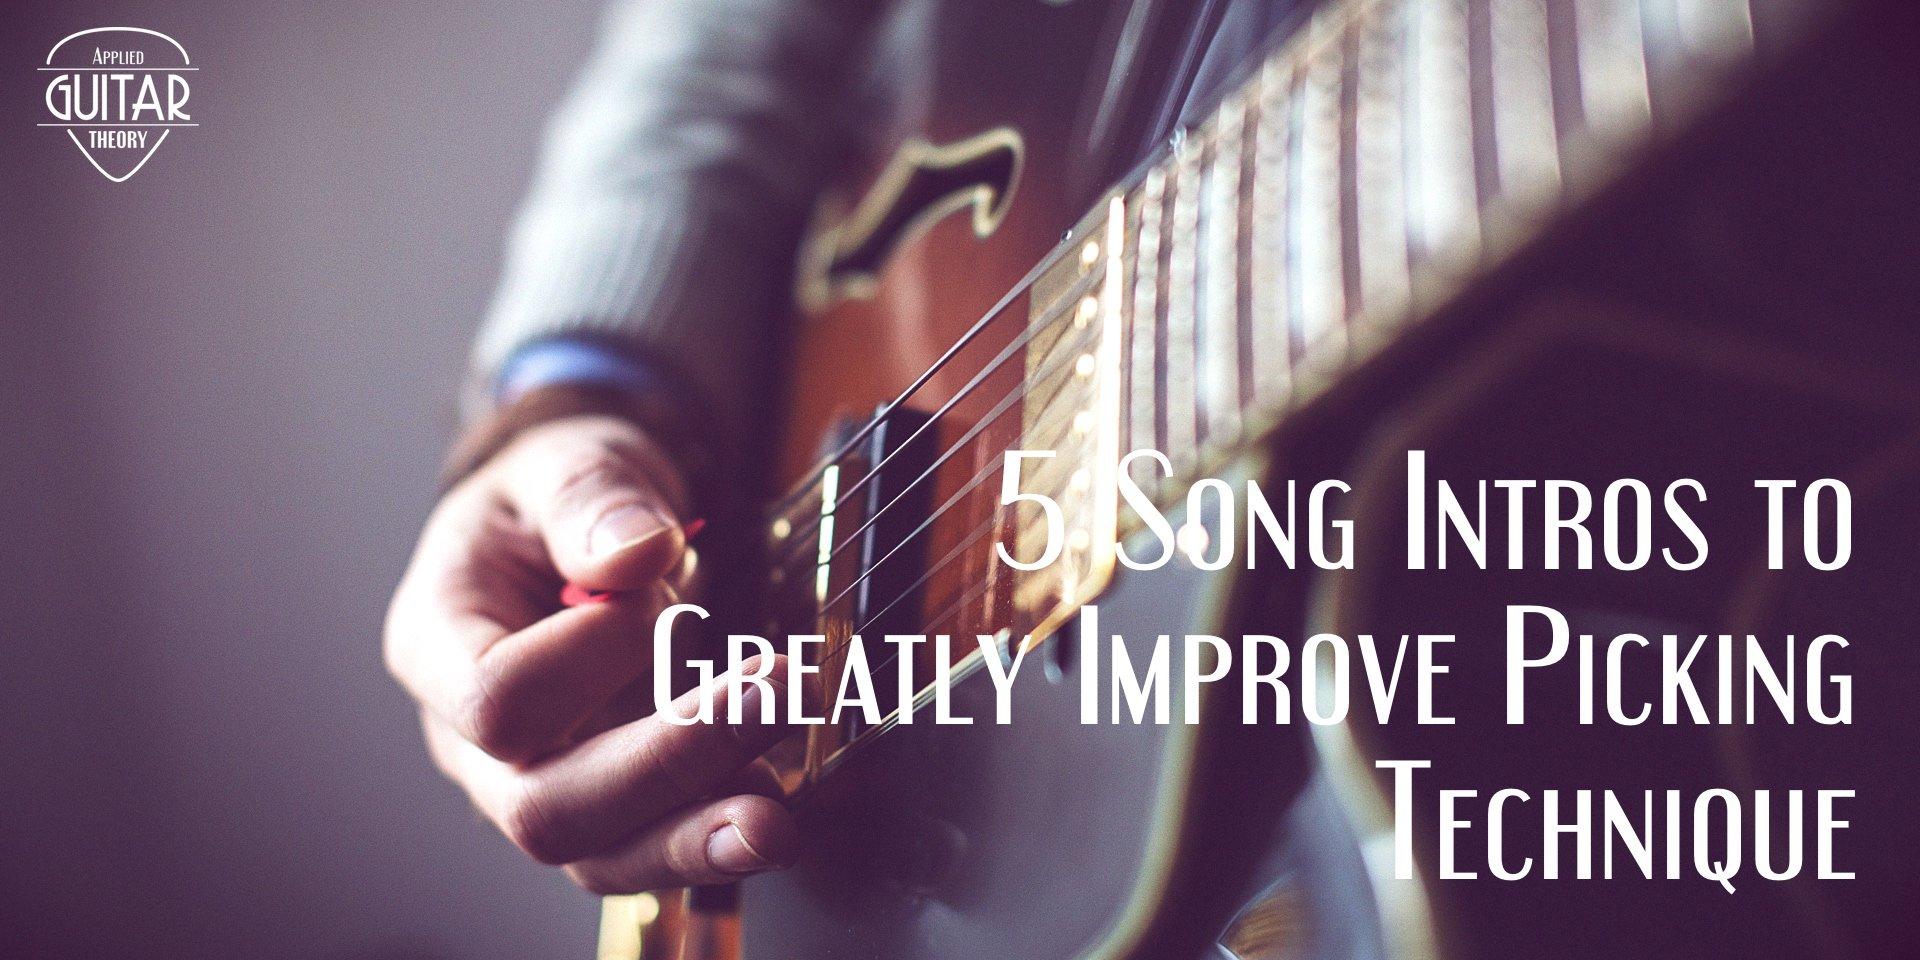 Improve picking technique featured image